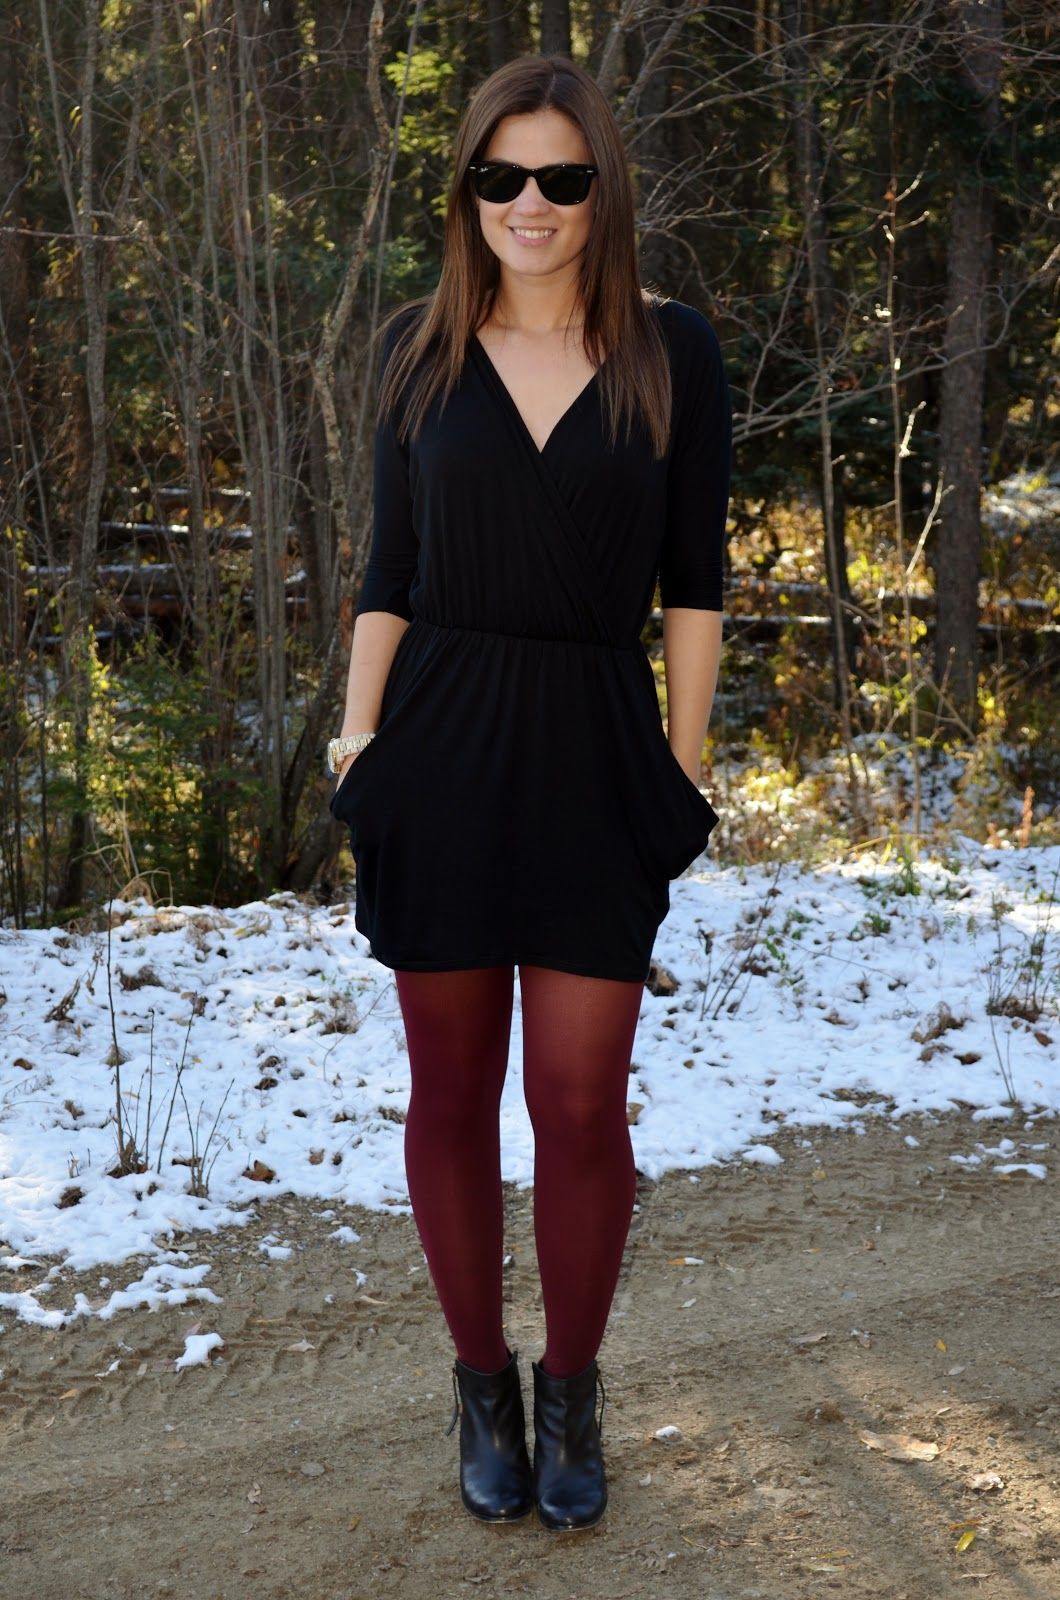 Oxblood Tights Colored Tights Black Dress Fashion Tights [ 1600 x 1060 Pixel ]